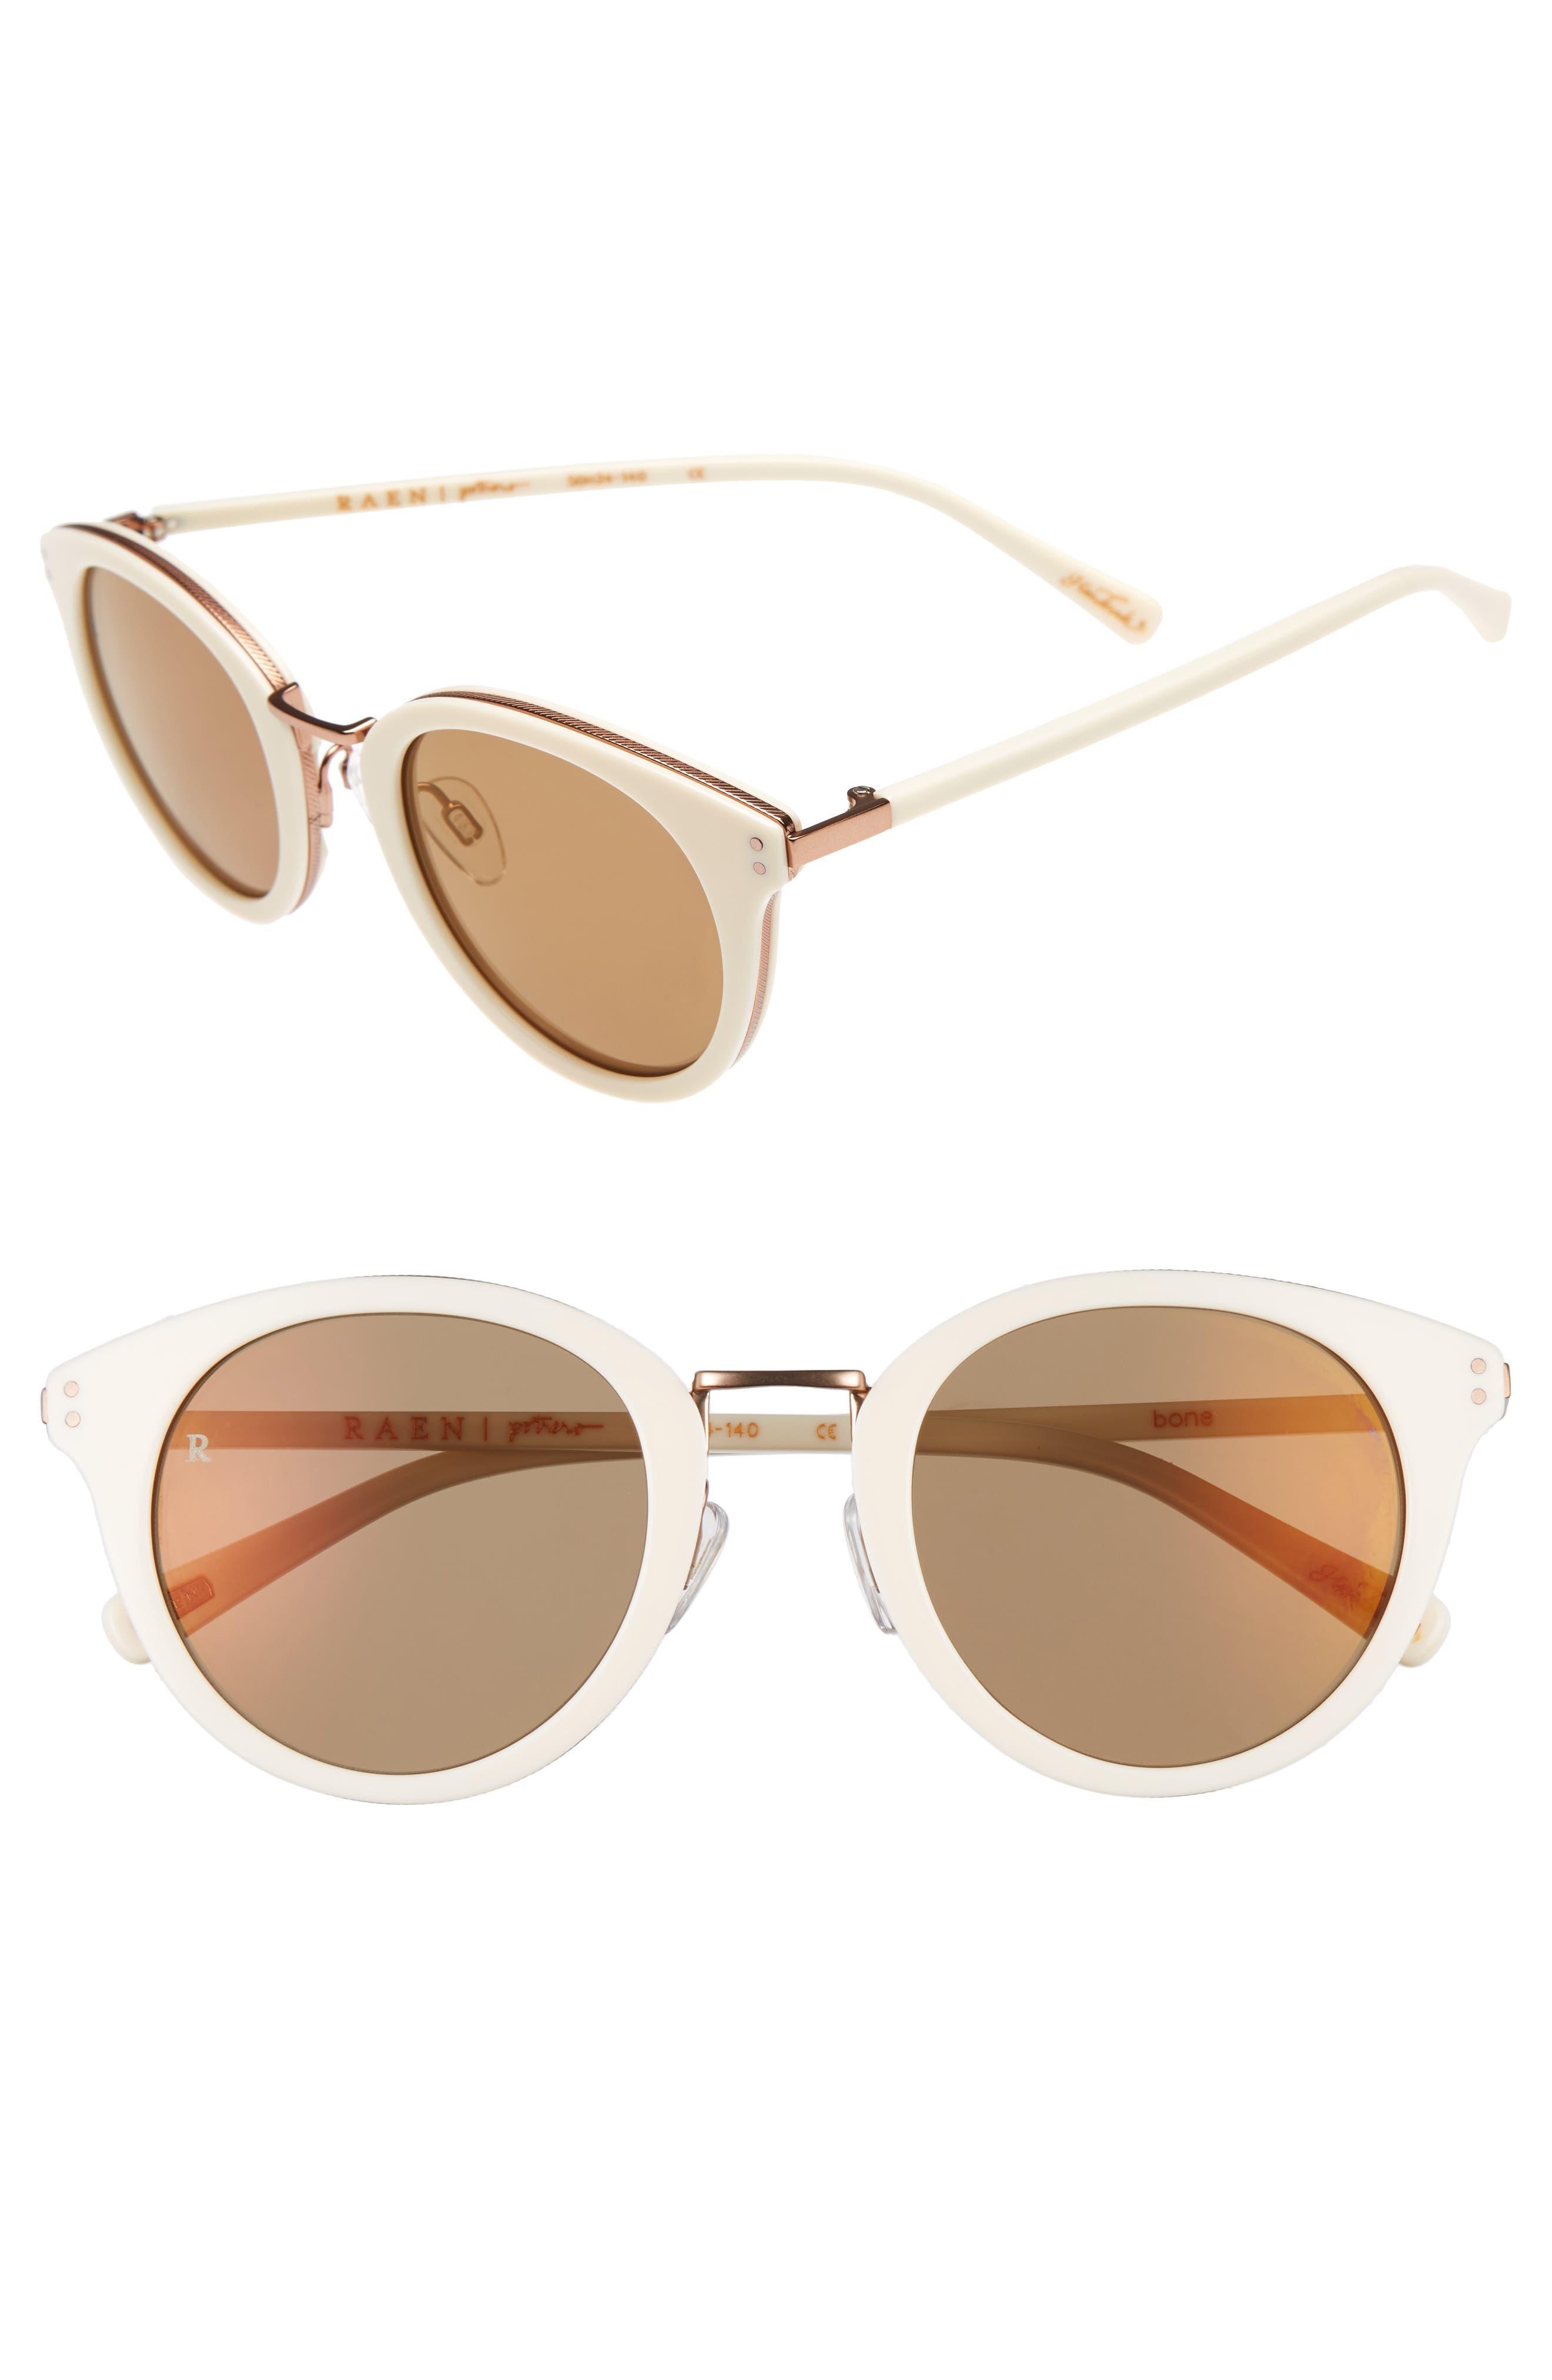 Main Image - RAEN Portrero 50mm Sunglasses